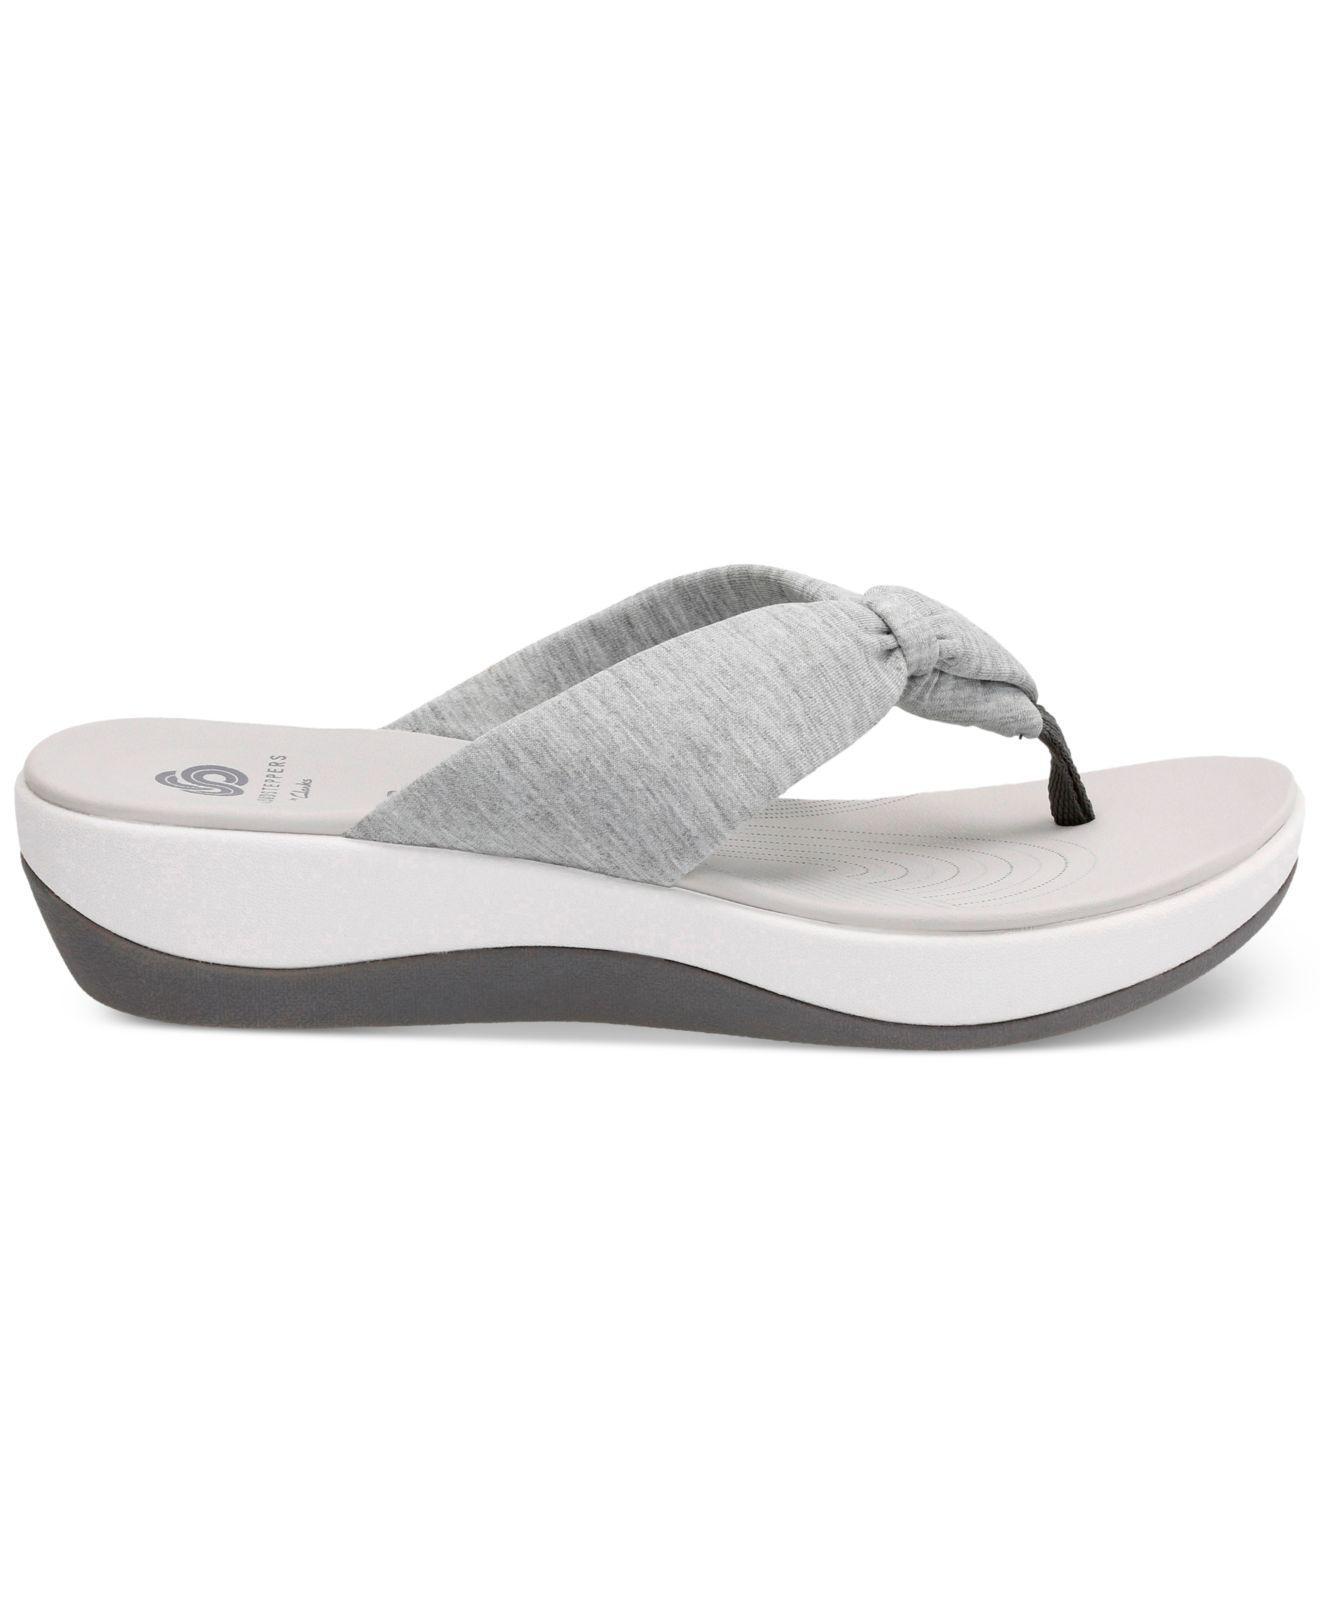 26c98d607333 Lyst - Clarks Arla Gilson Flip Flops in Gray - Save 27%